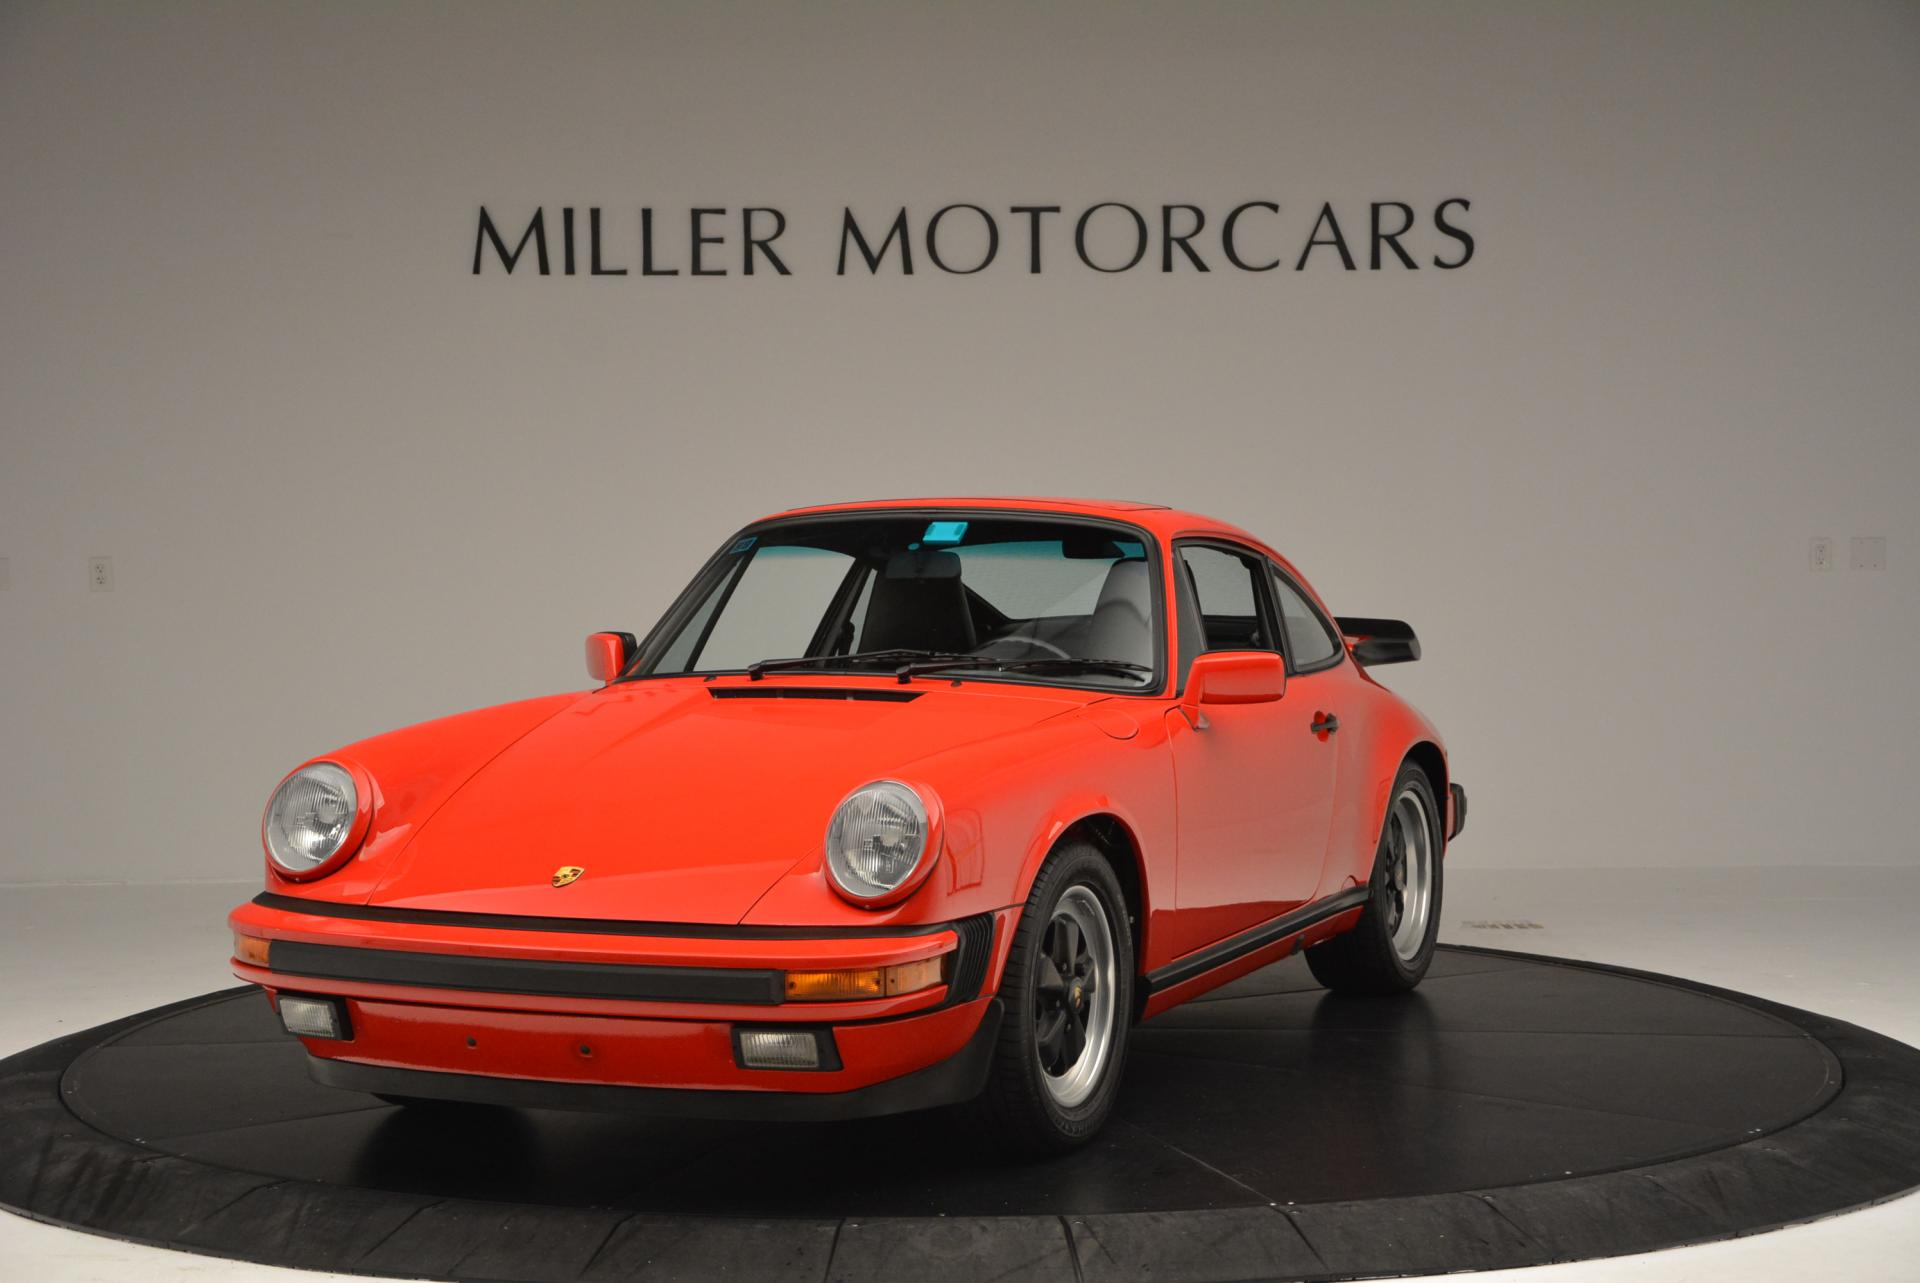 Used 1988 Porsche 911 Carrera for sale Sold at Alfa Romeo of Greenwich in Greenwich CT 06830 1